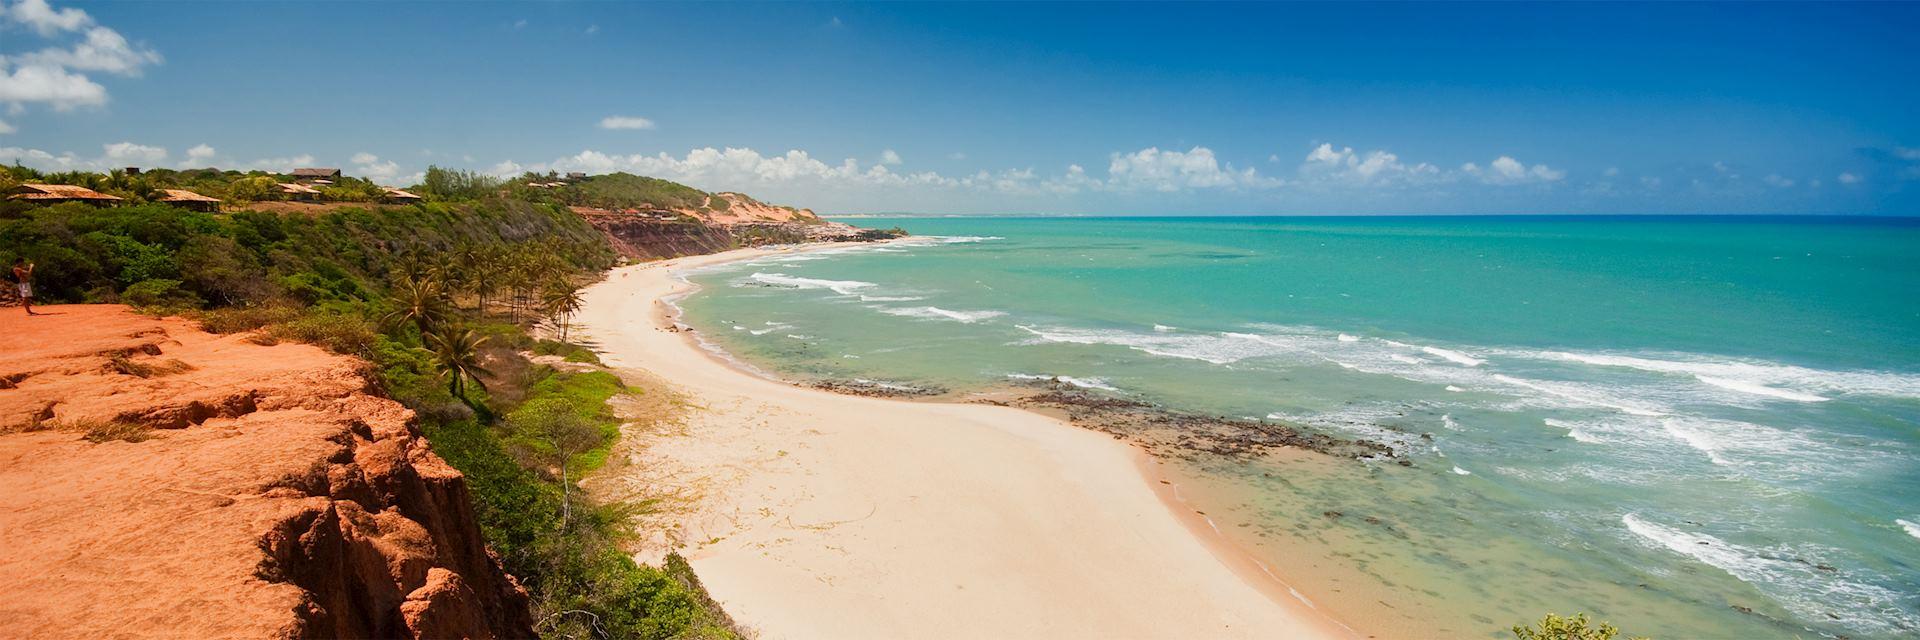 Praia do Amor beach, Pipa